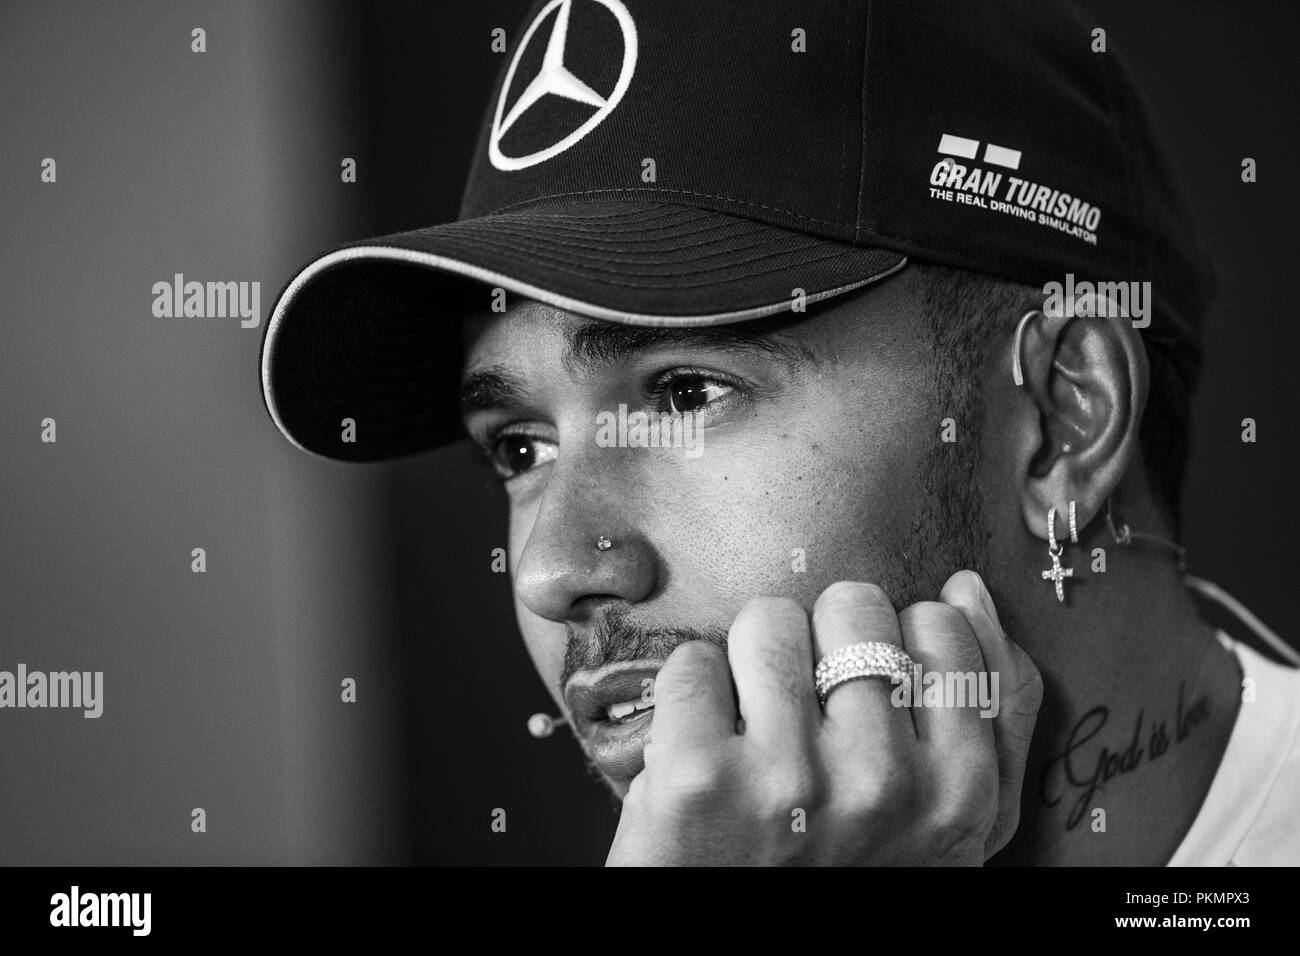 Lewis Hamilton Black and White Stock Photos   Images - Alamy 25c5f3b80649